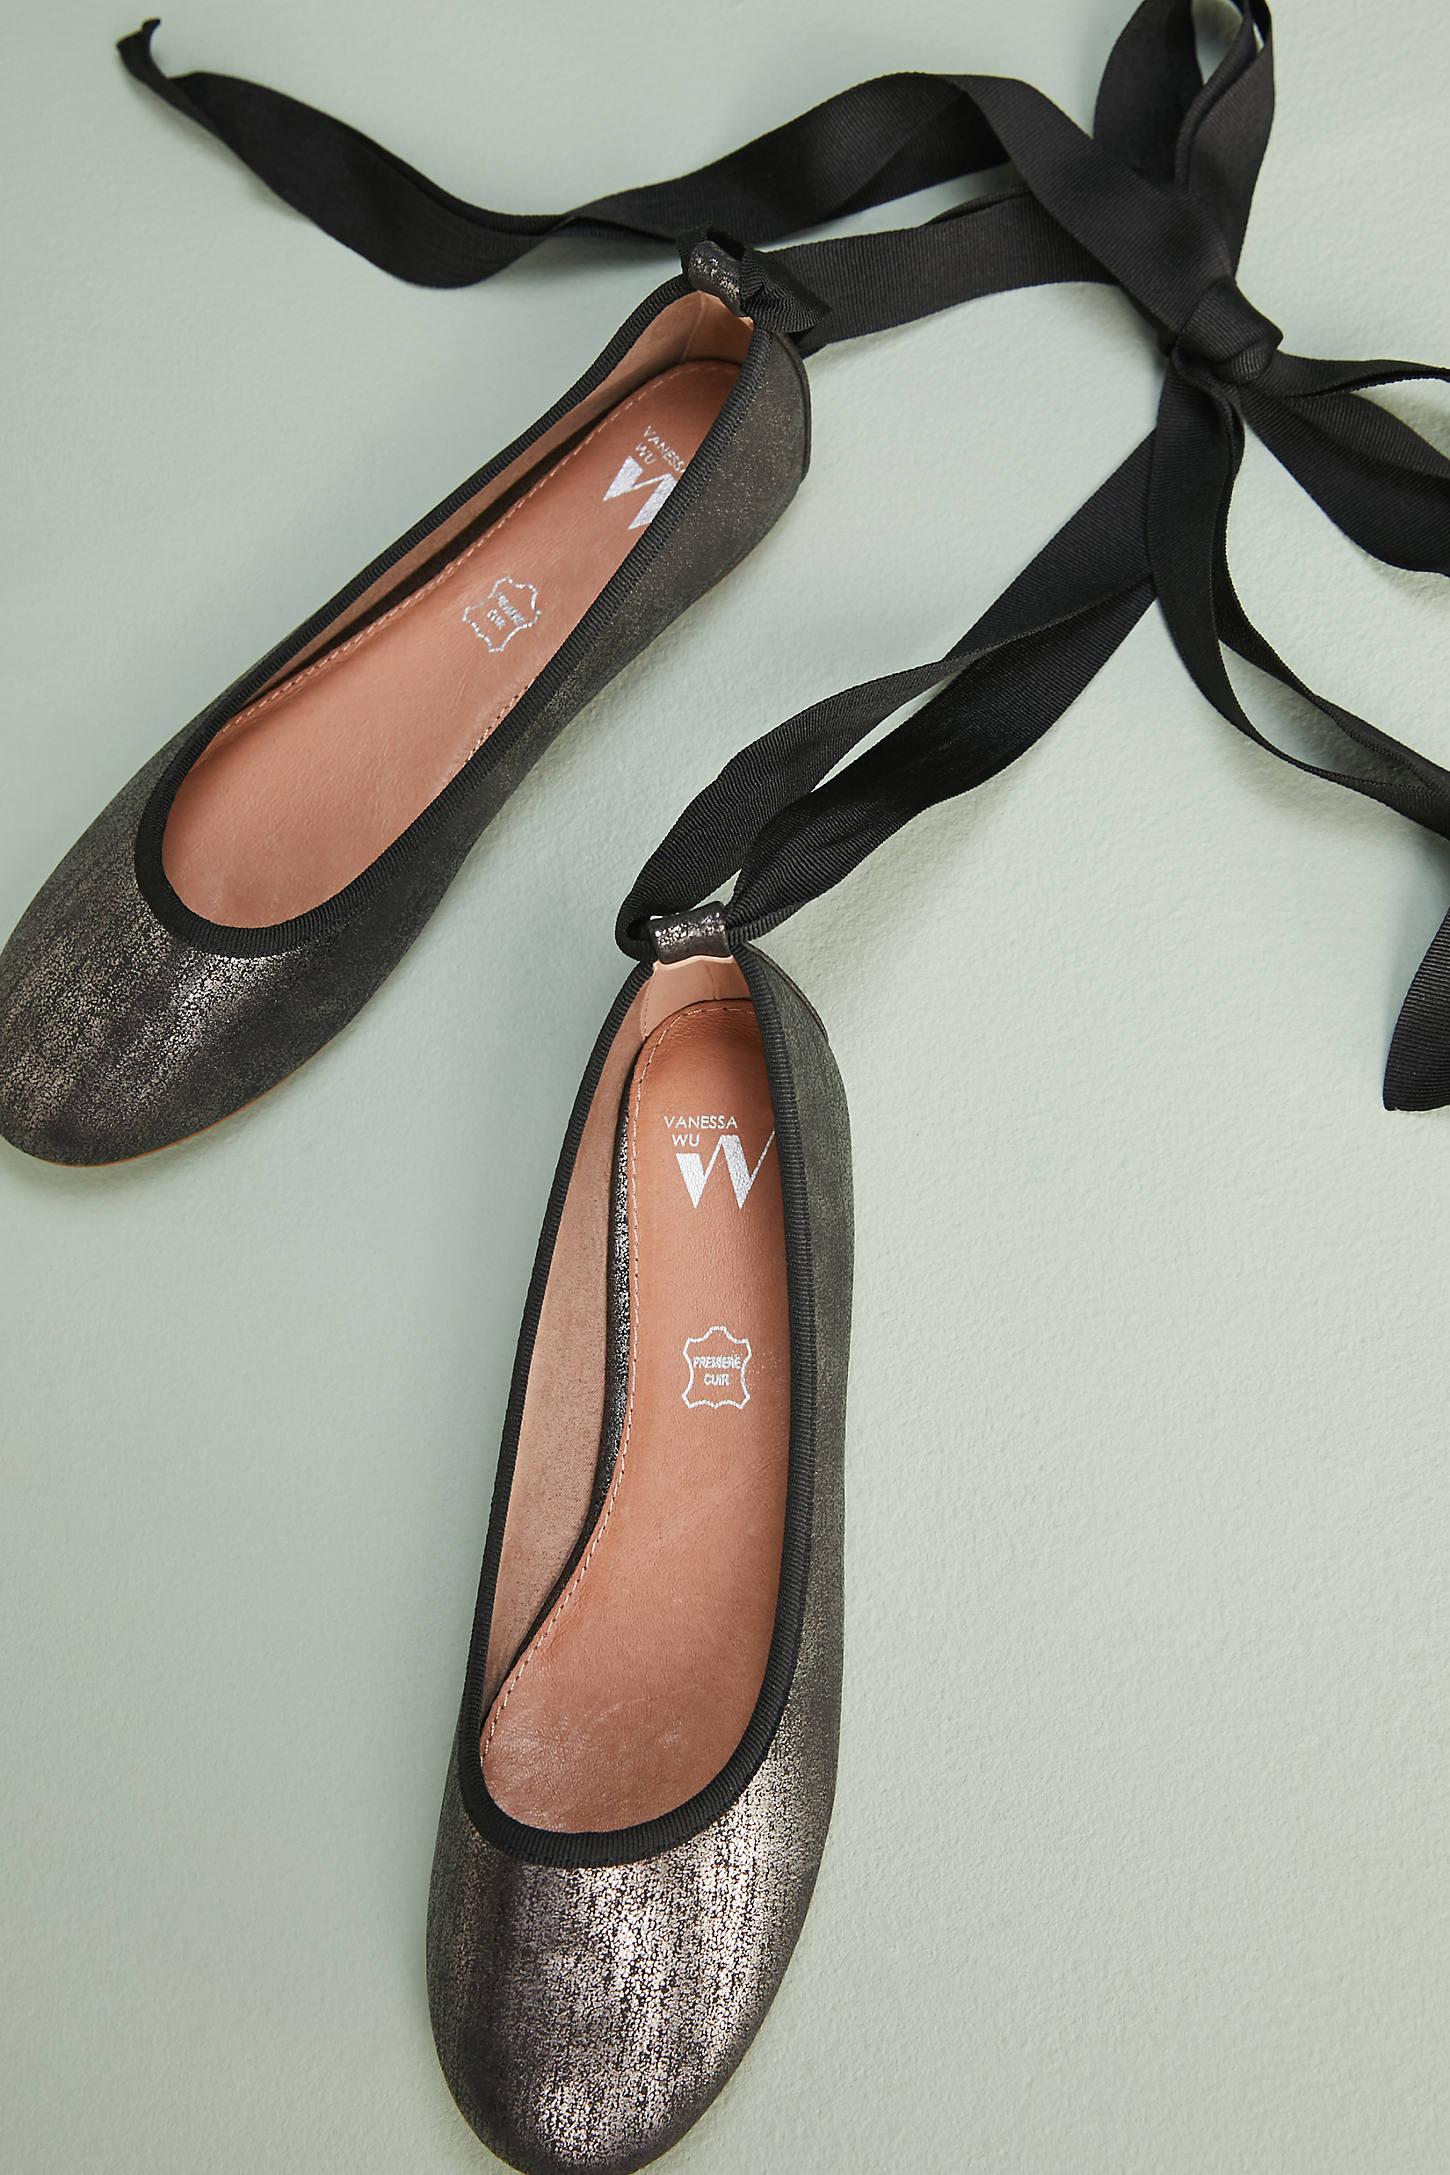 Vanessa Wu Ribbon-Tied Ballet Flats